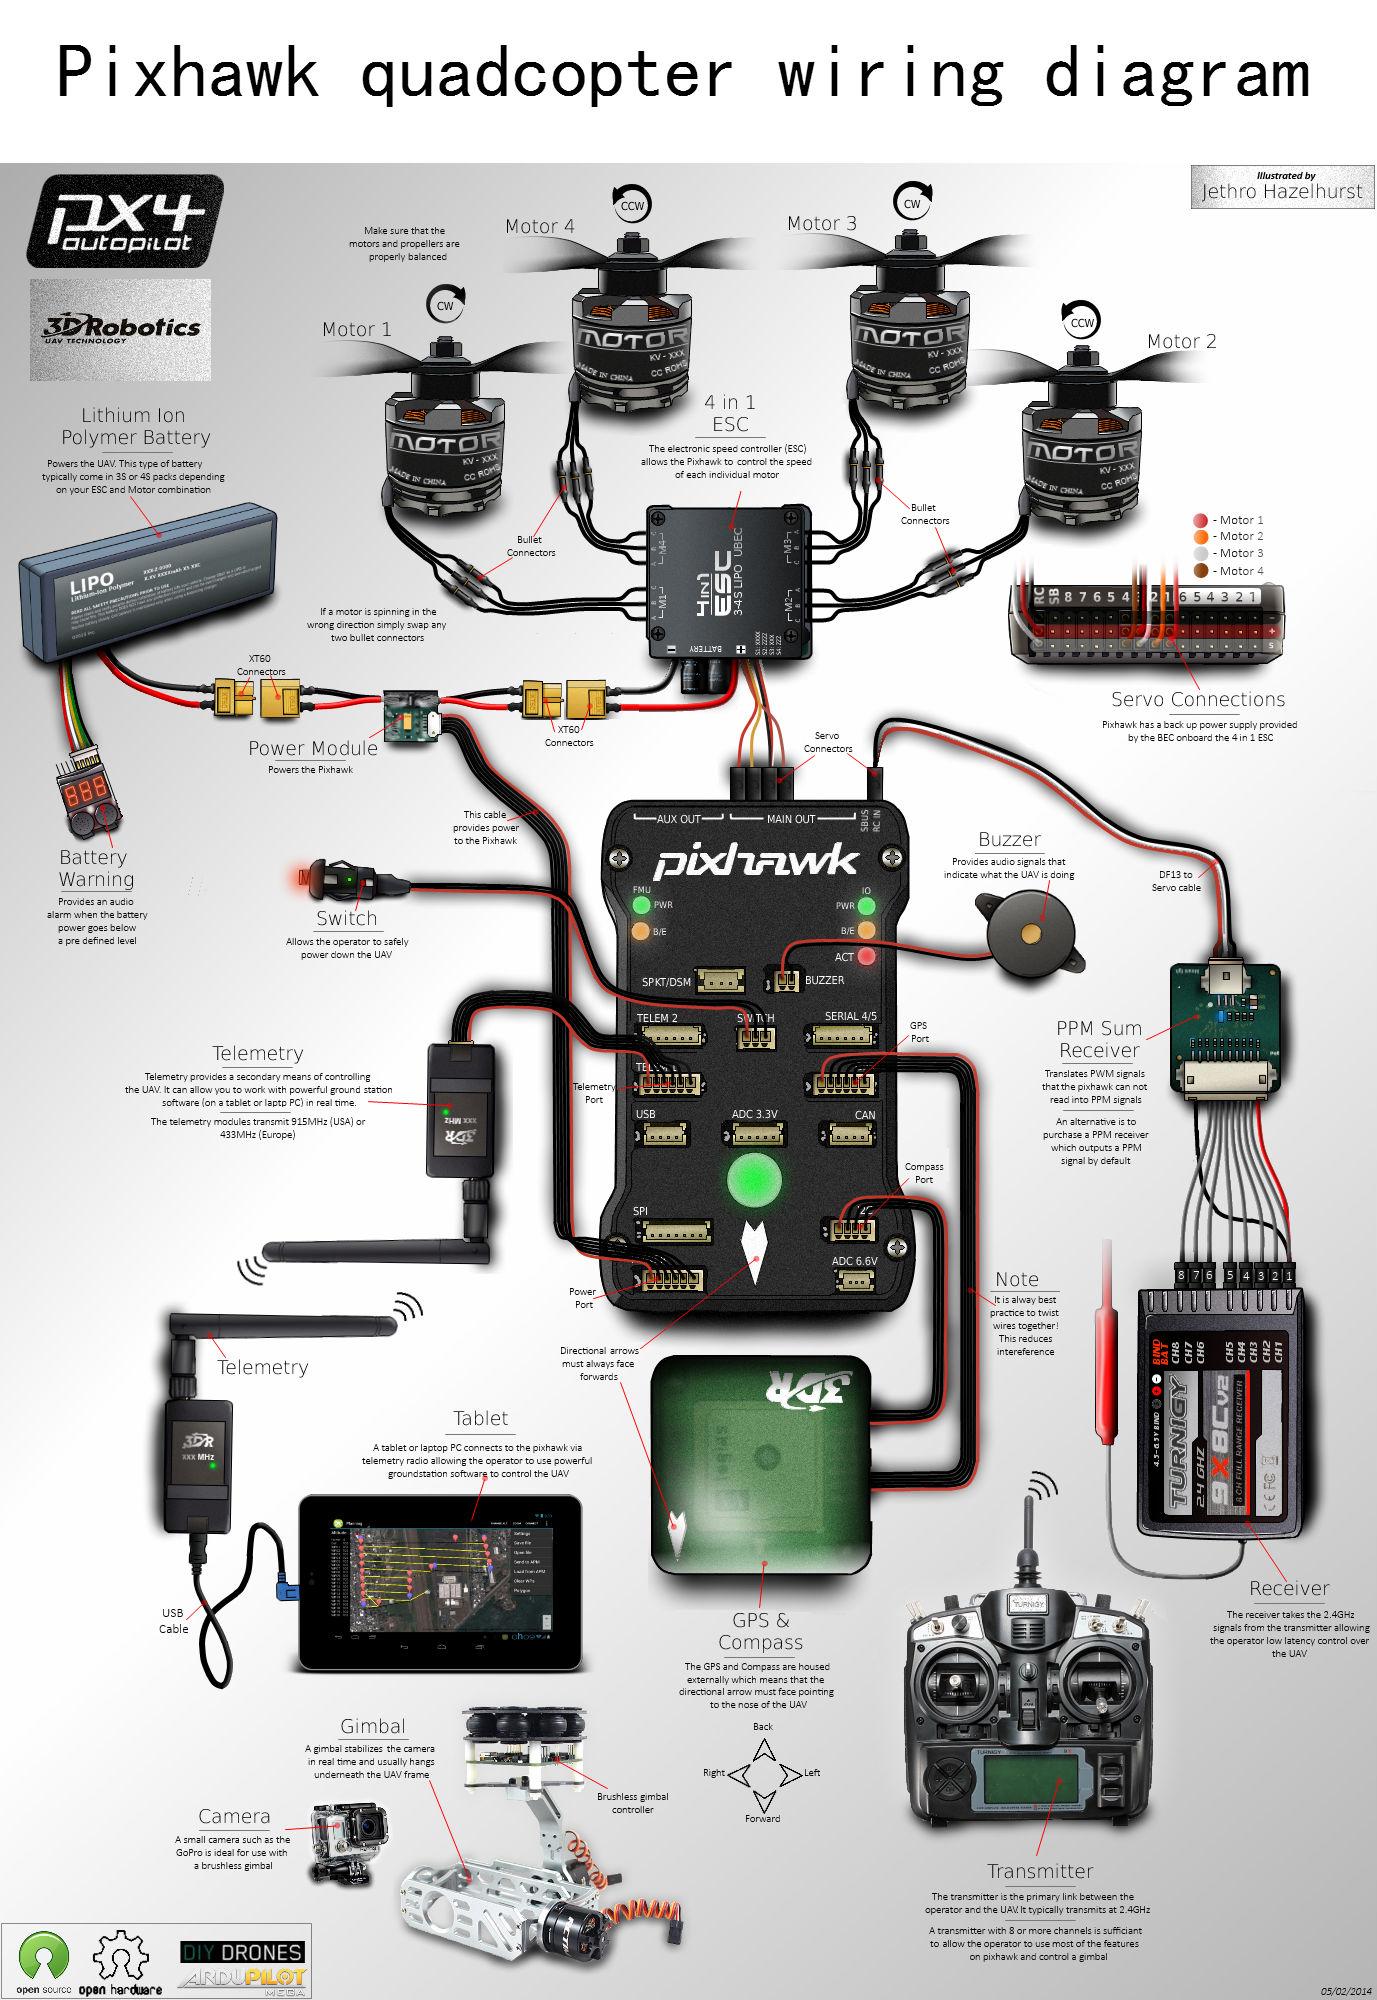 fpv quadcopter wiring diagram 94 integra stereo guide diy